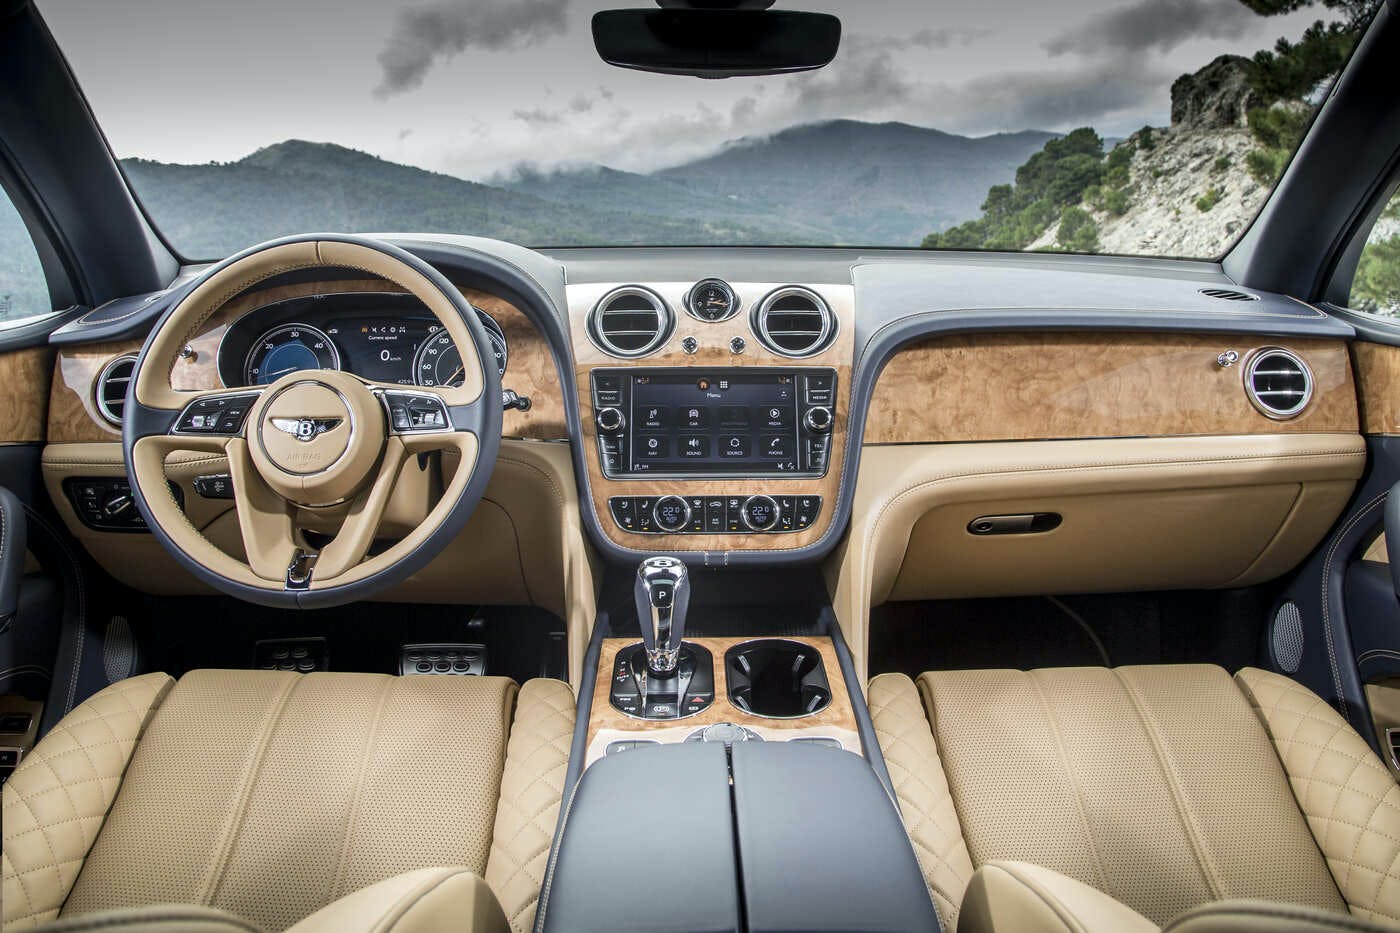 Bentley Suv 2020 Interior Cars Interiors 2020